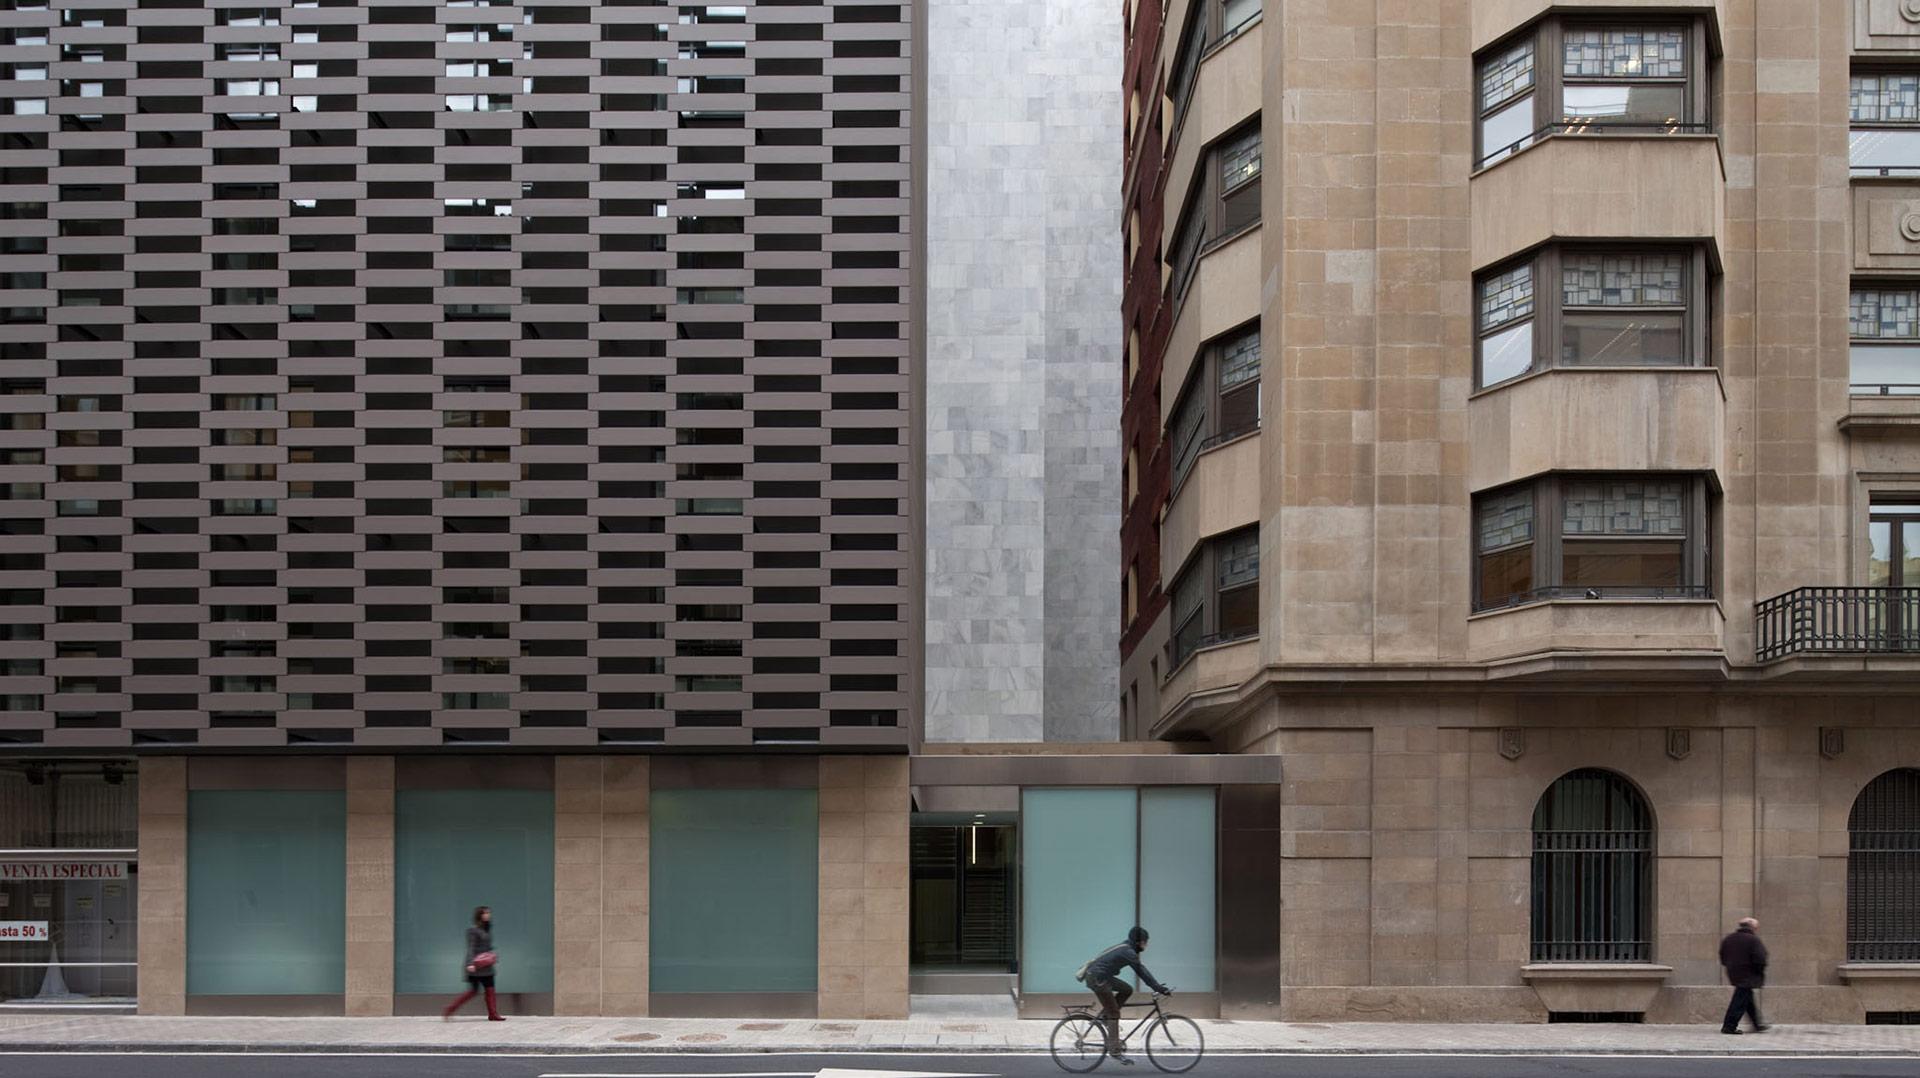 10_0_Portada_hacienda-slide-ByEarquitectos-pamplona-navarra